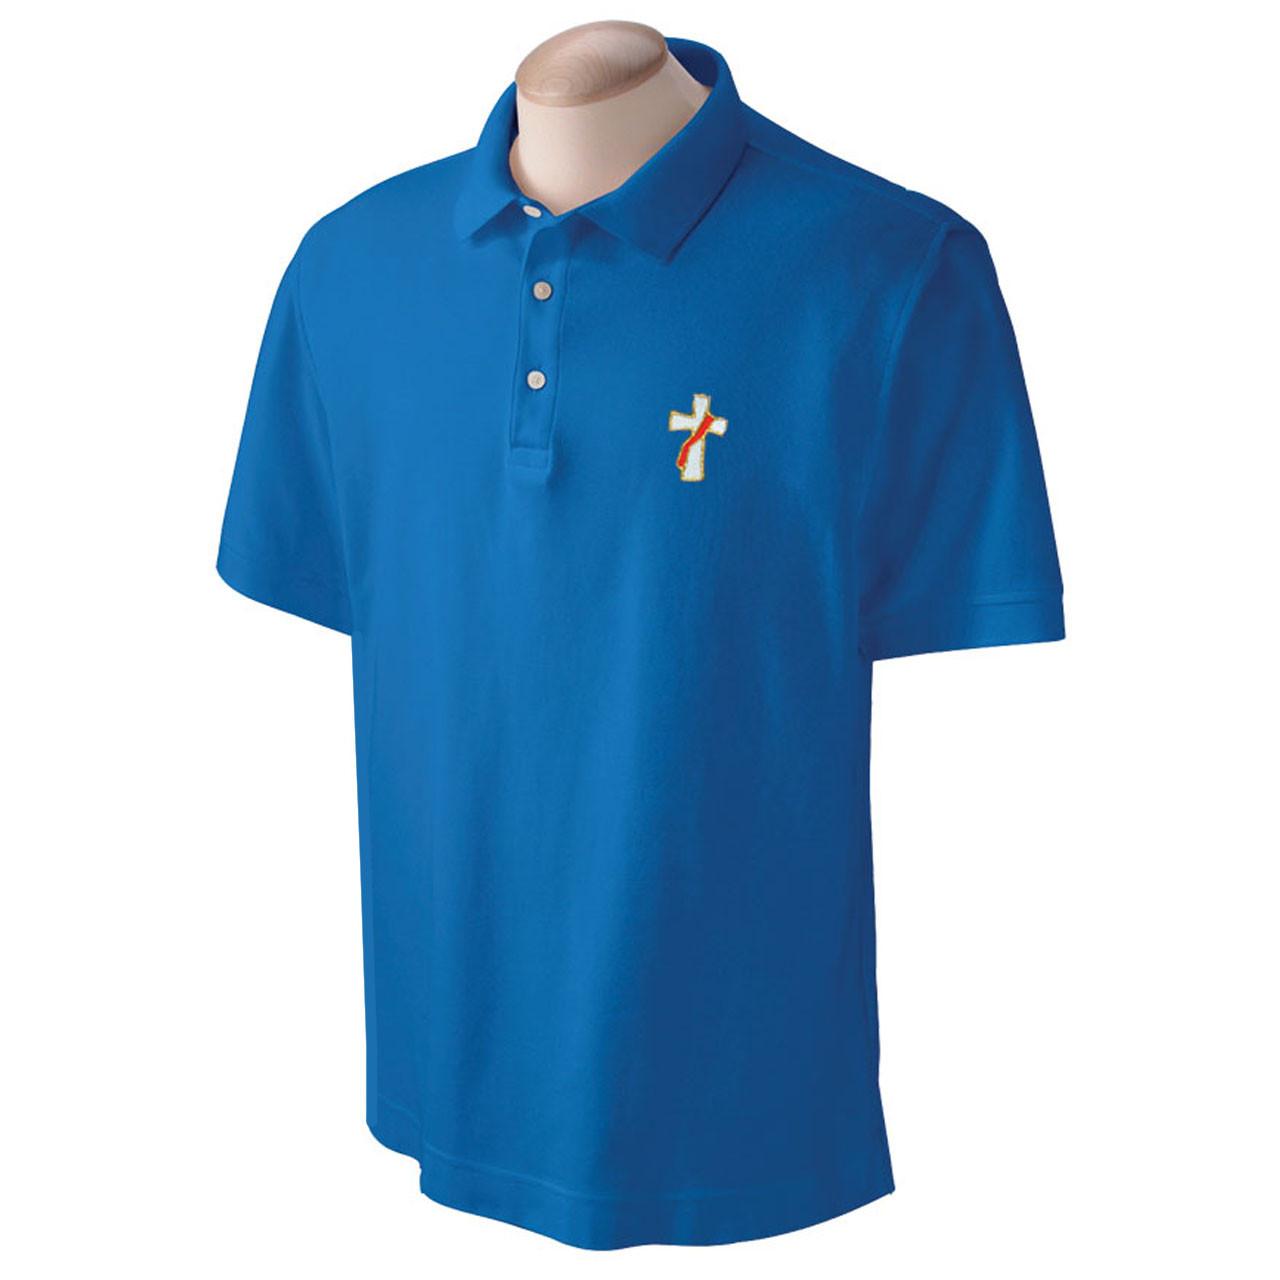 100% Peruvian Pima Cotton Polo Shirt